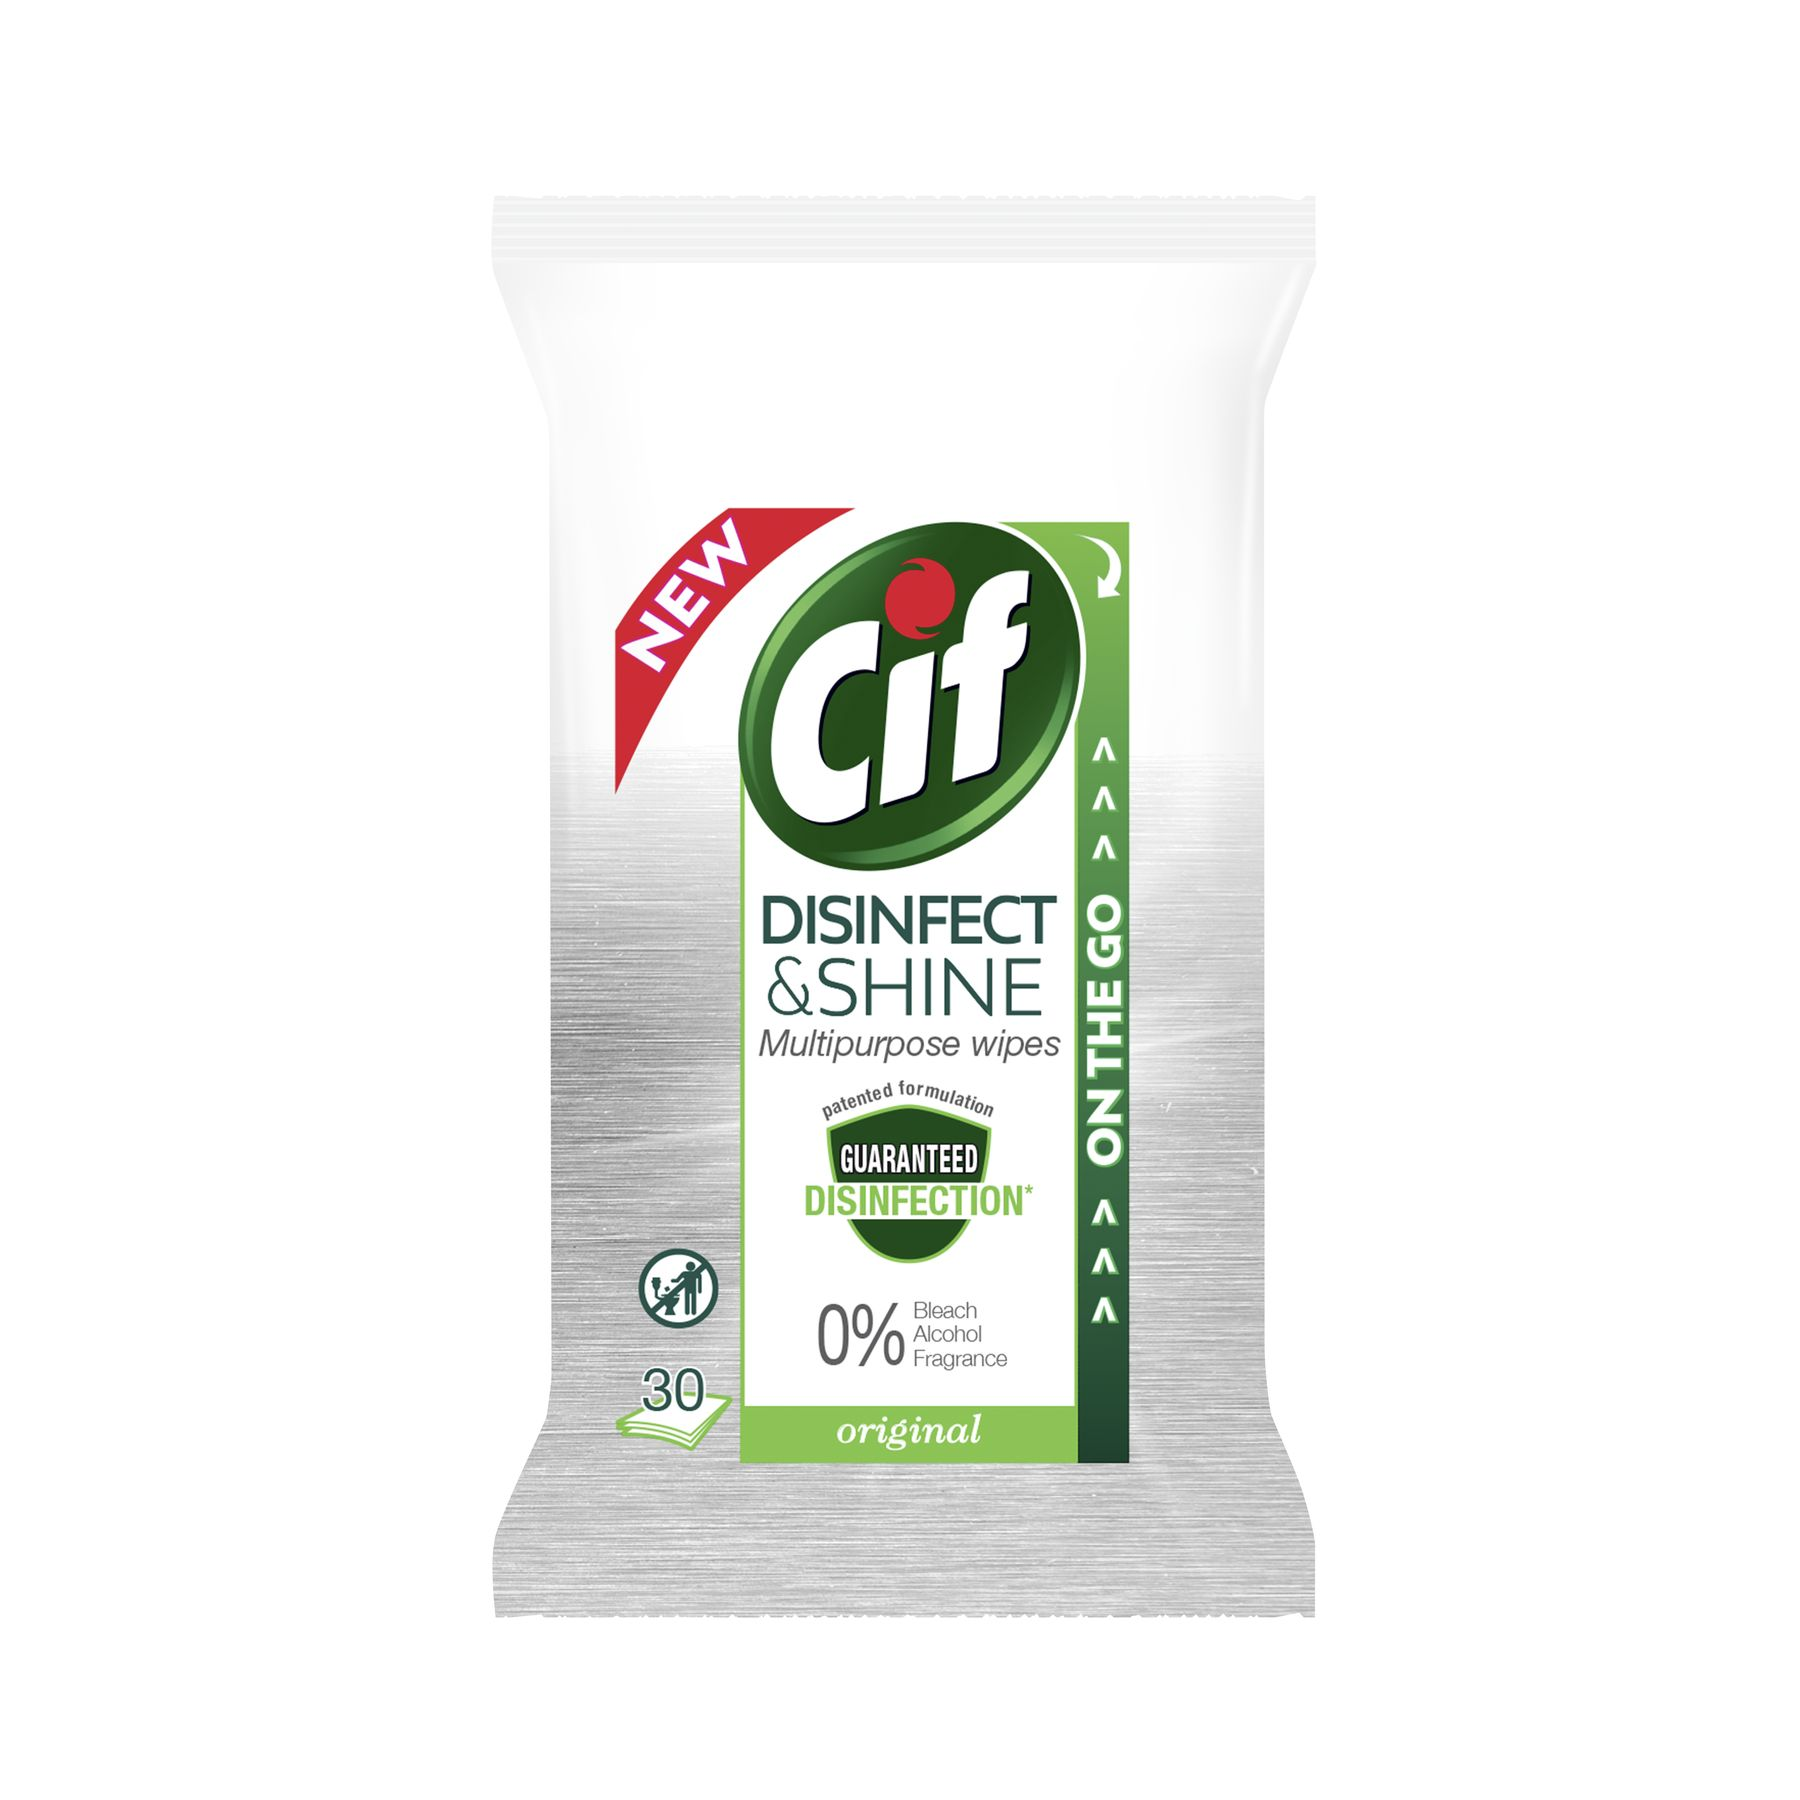 Cif Disinfect & Shine Multipurpose Original Wipes 30 doekjes